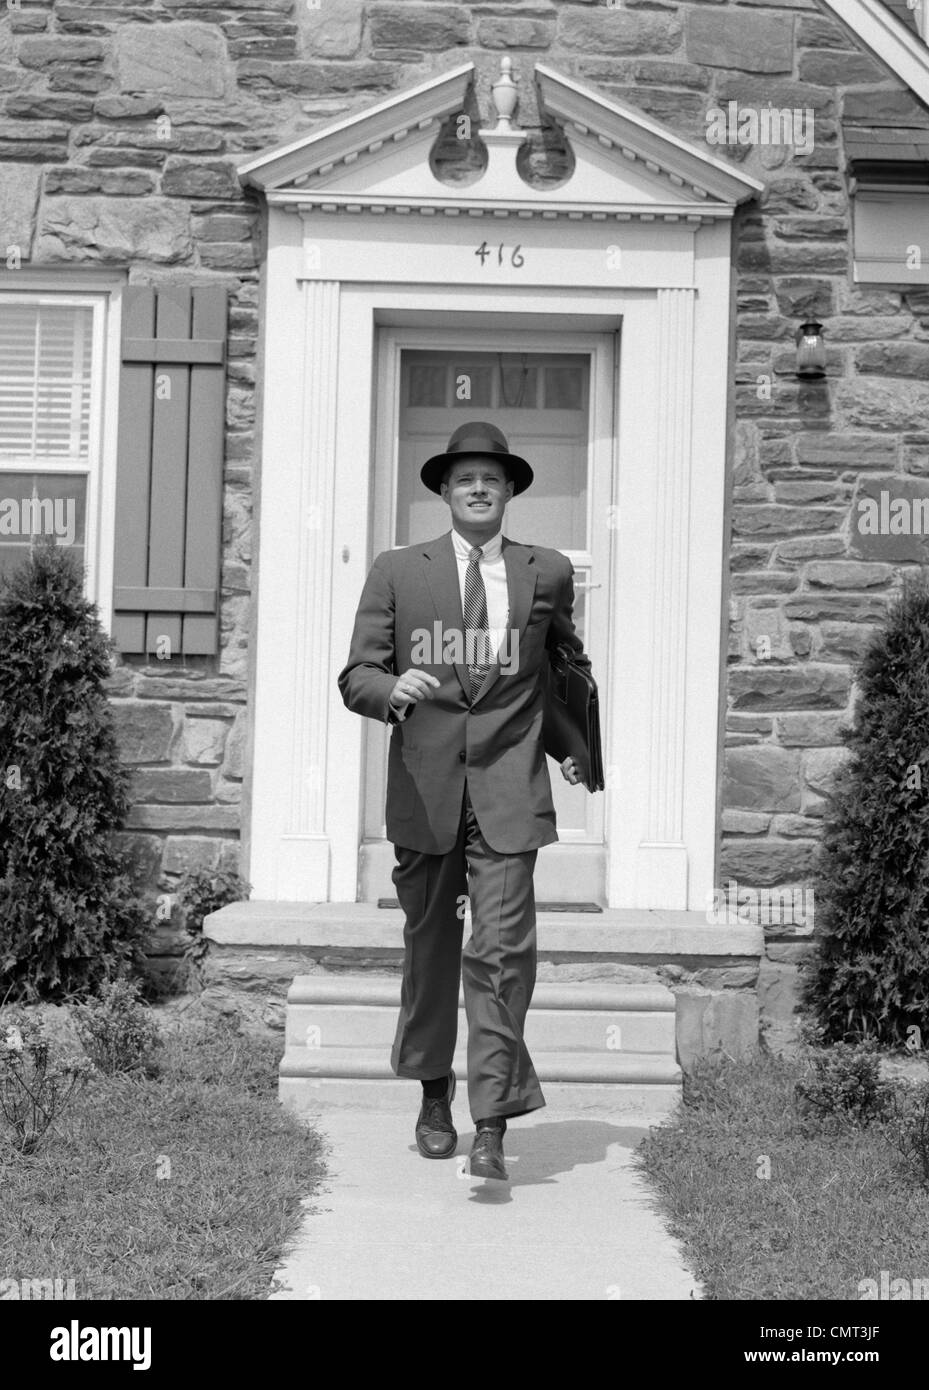 1950s Man Smiling Businessman Proud Look Of Satisfaction